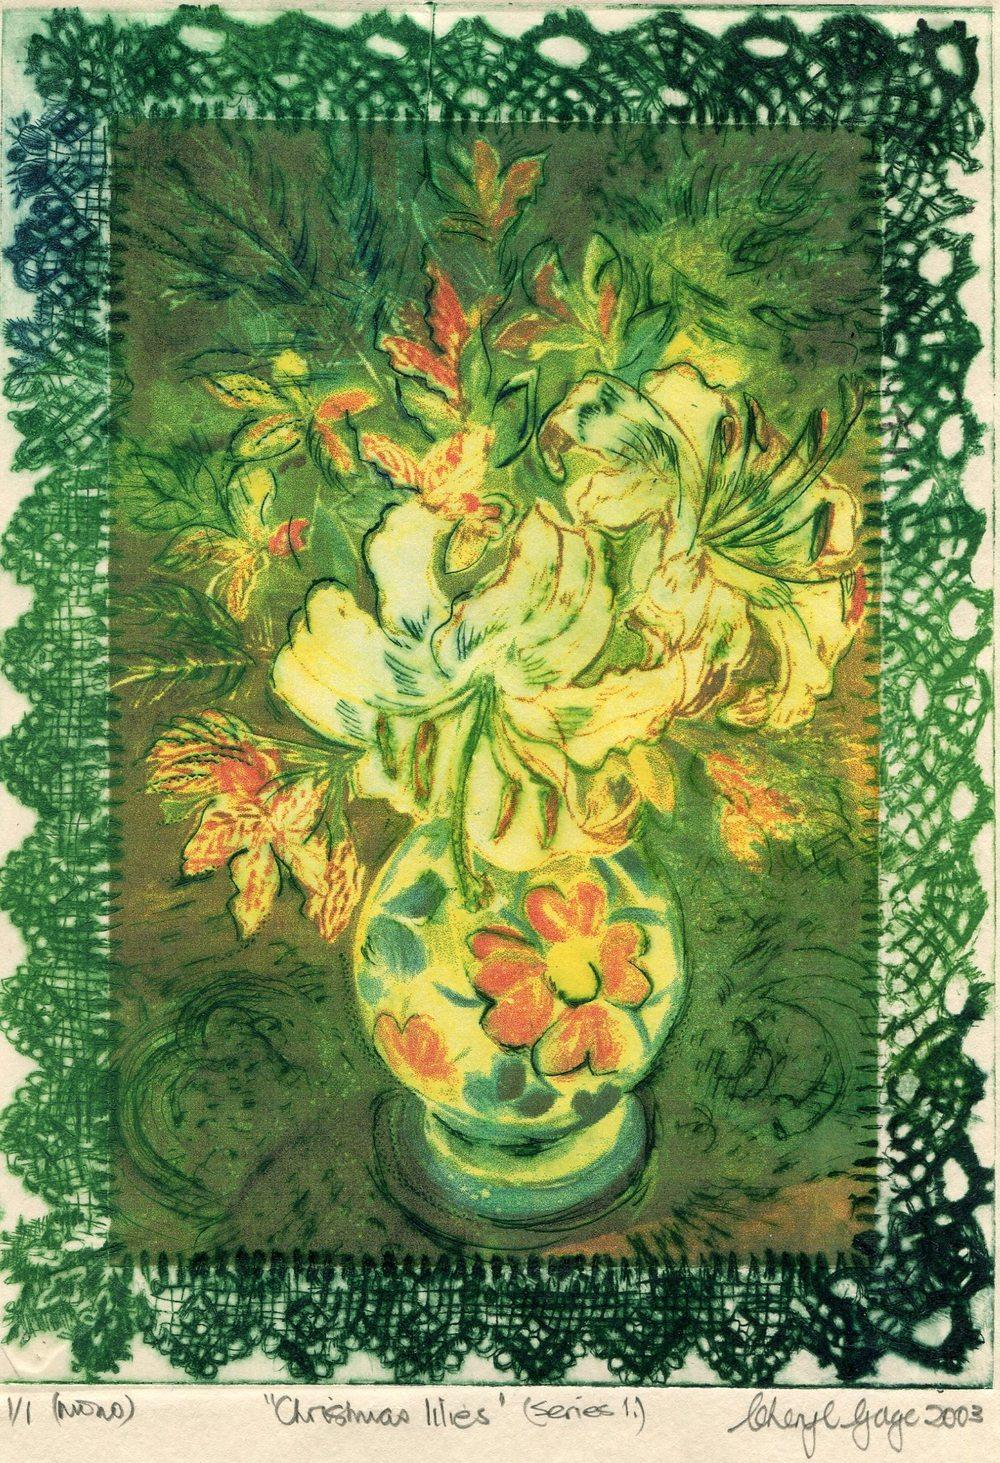 98a Gage, Cheryl- Christmas Lilies  (series I).jpg